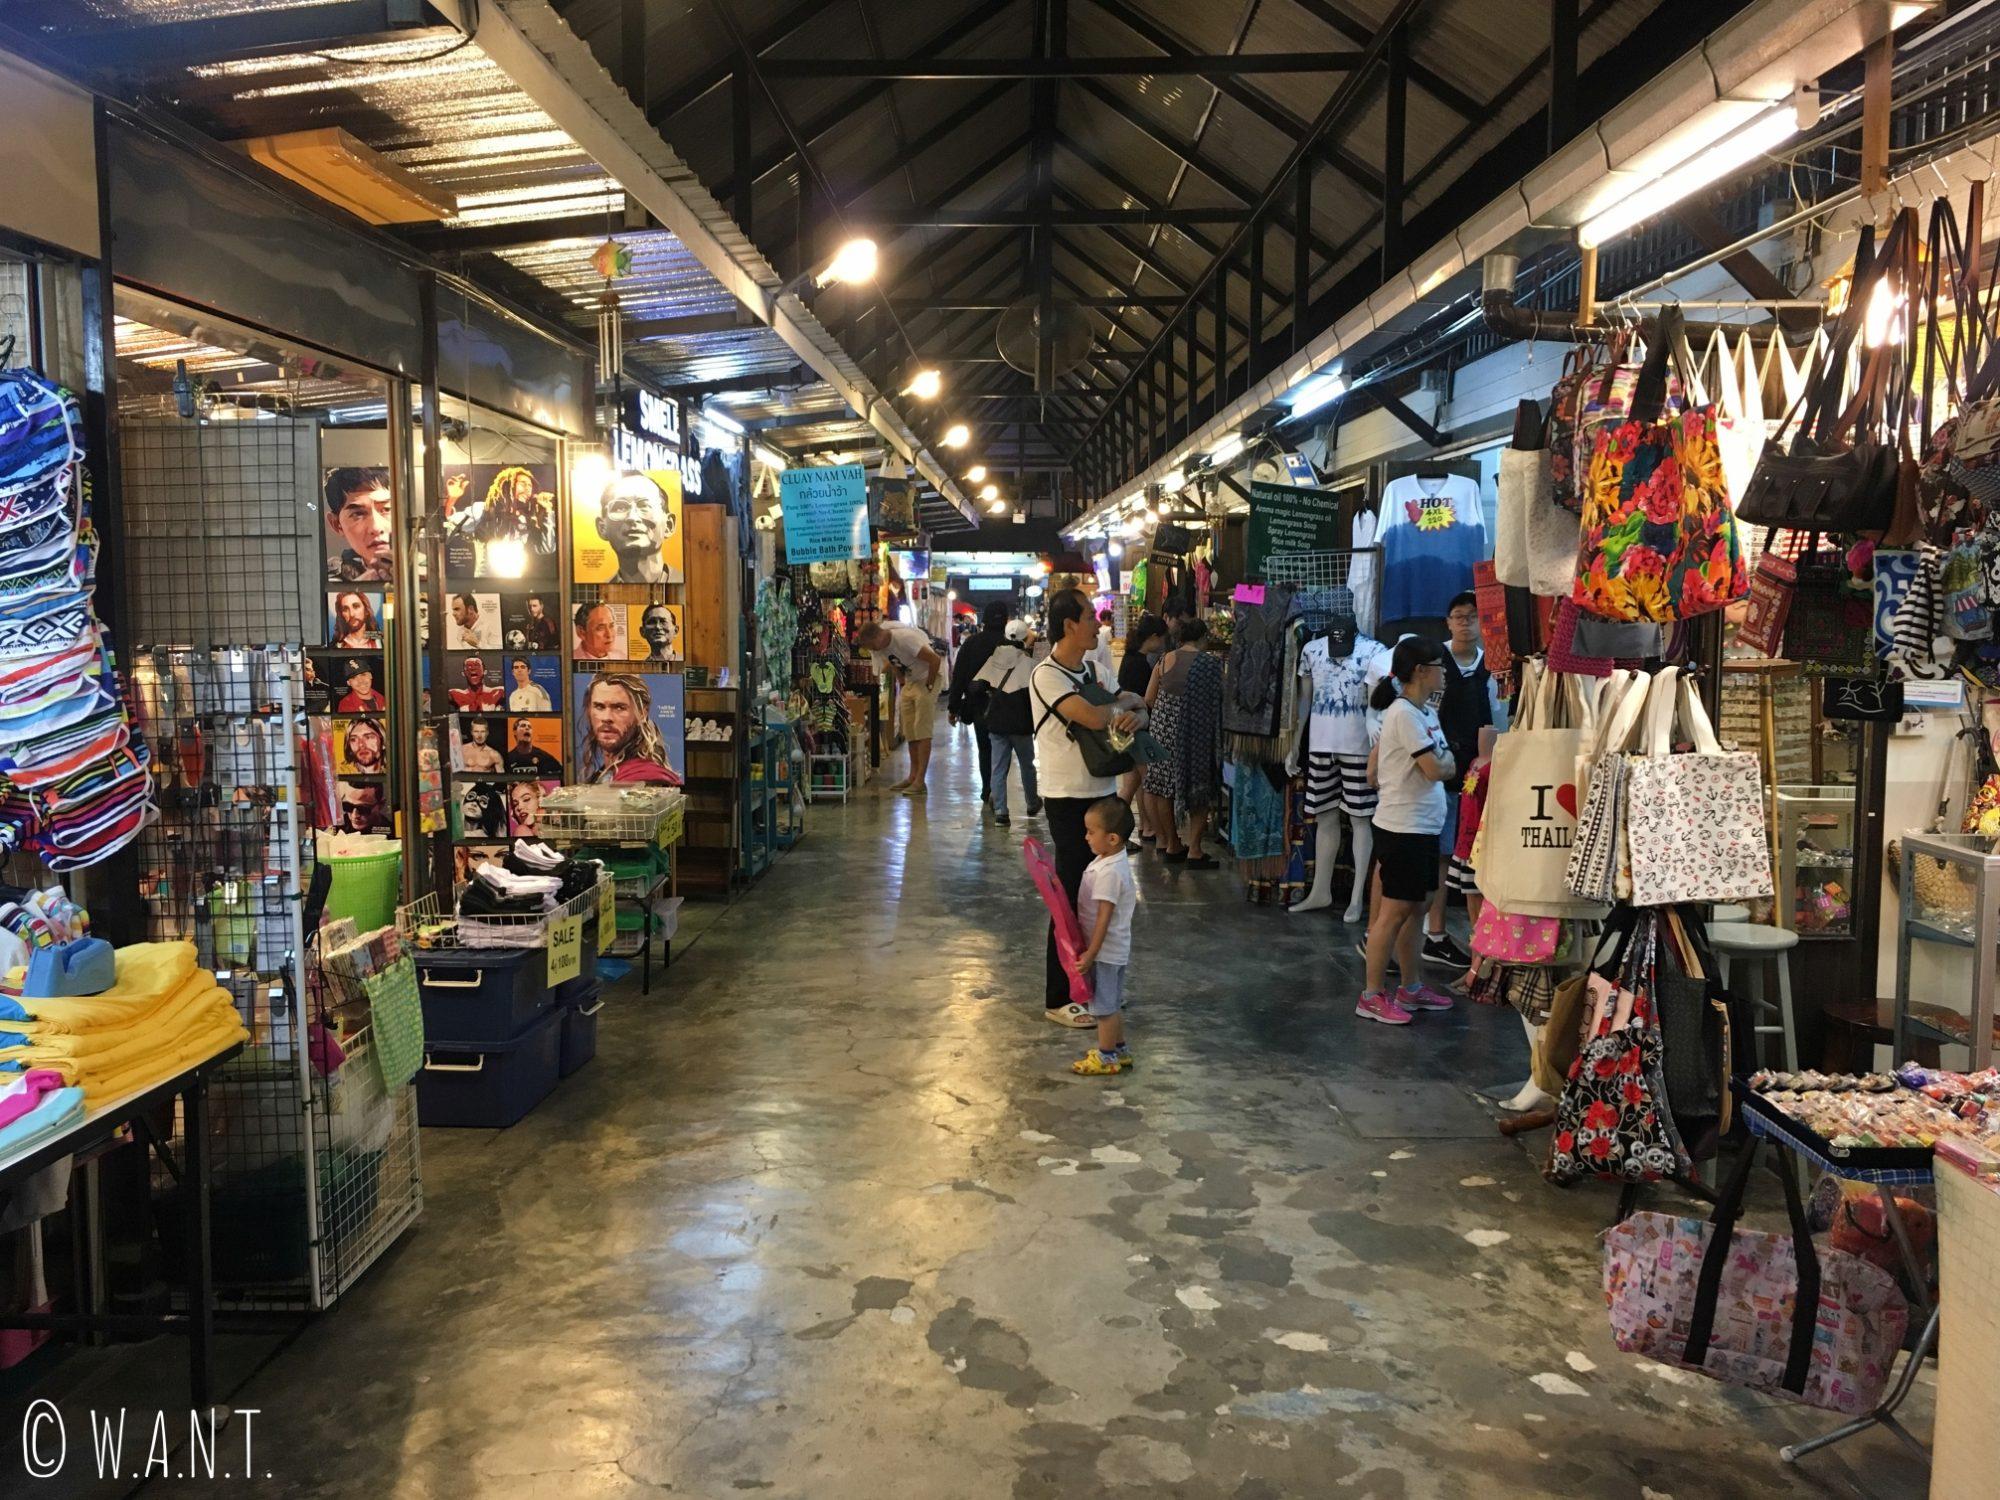 Allée du marché de nuit de Hua Hin